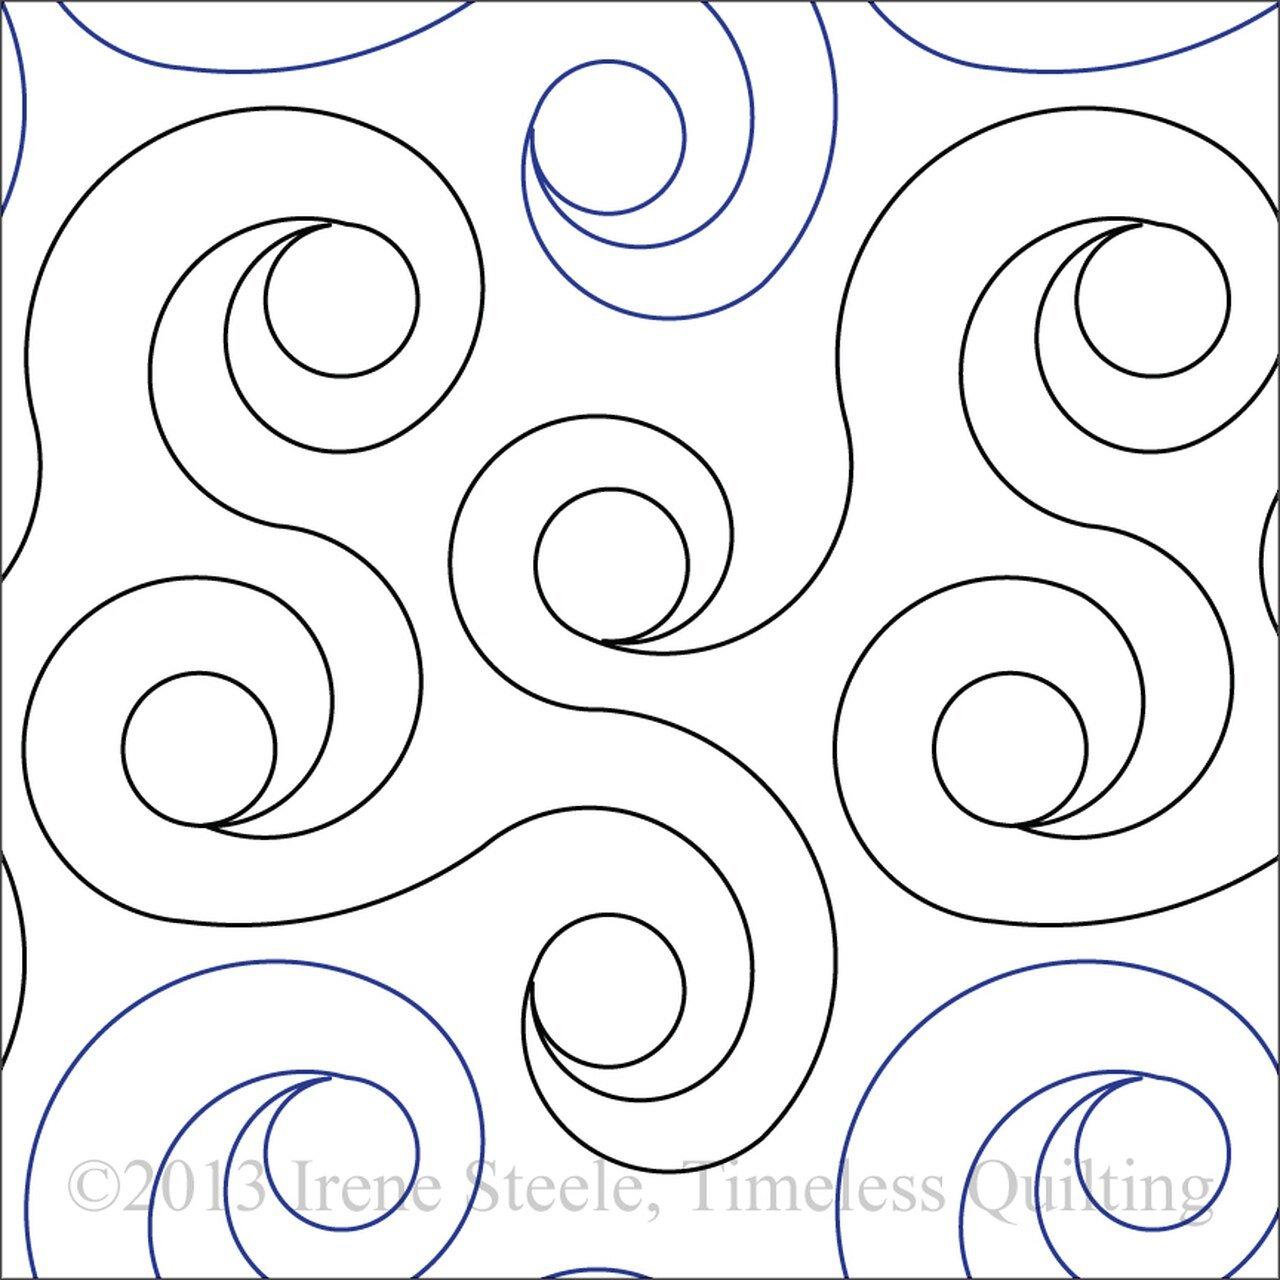 Spiral Rings - 10 in.